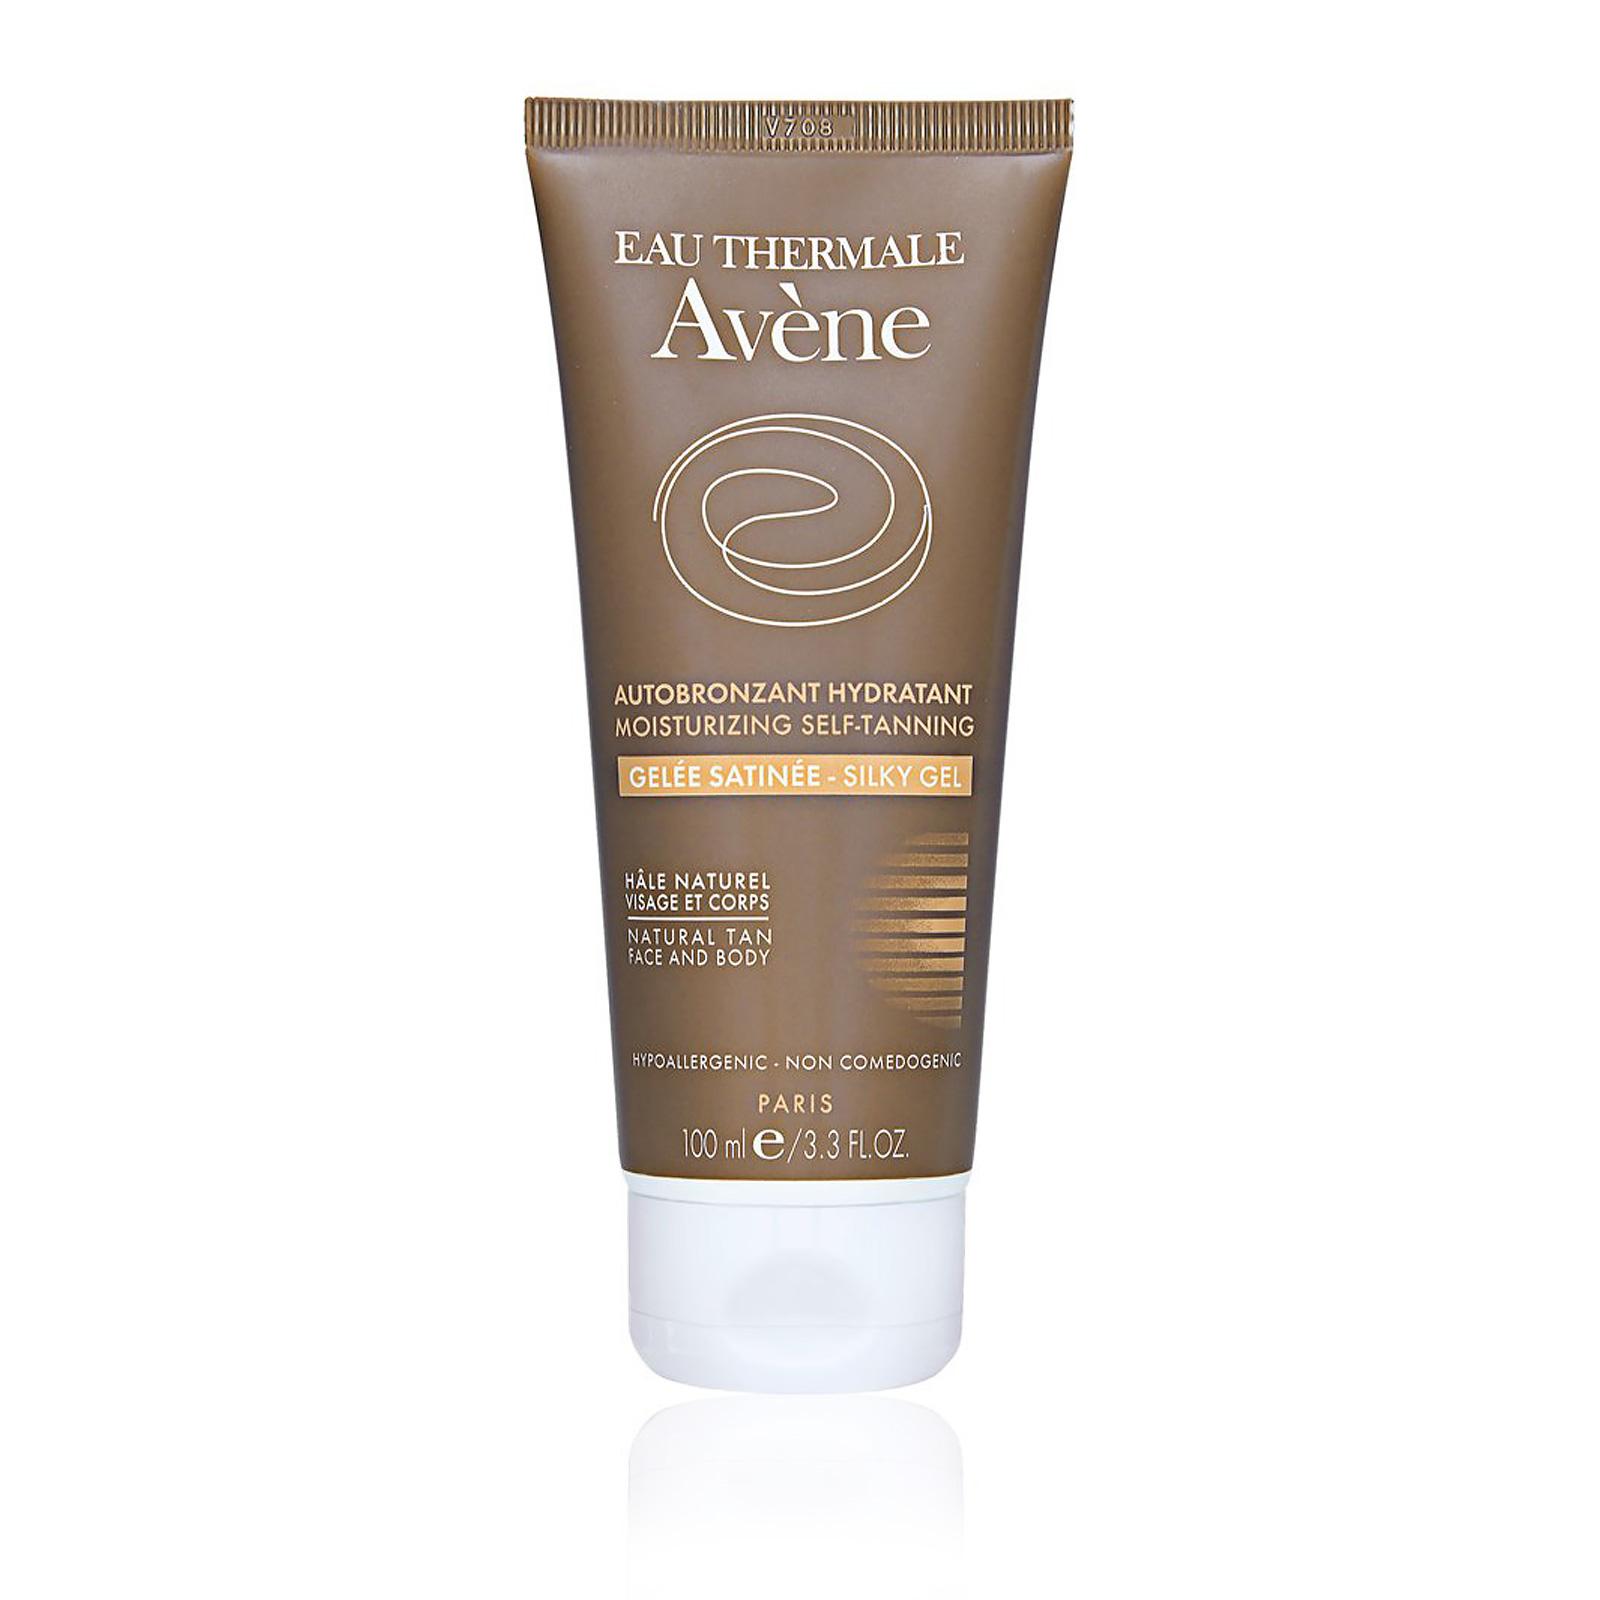 Autobronzant Hydratant Moisturizing Self-Tanning Silky Gel (For Sensitive Skin)